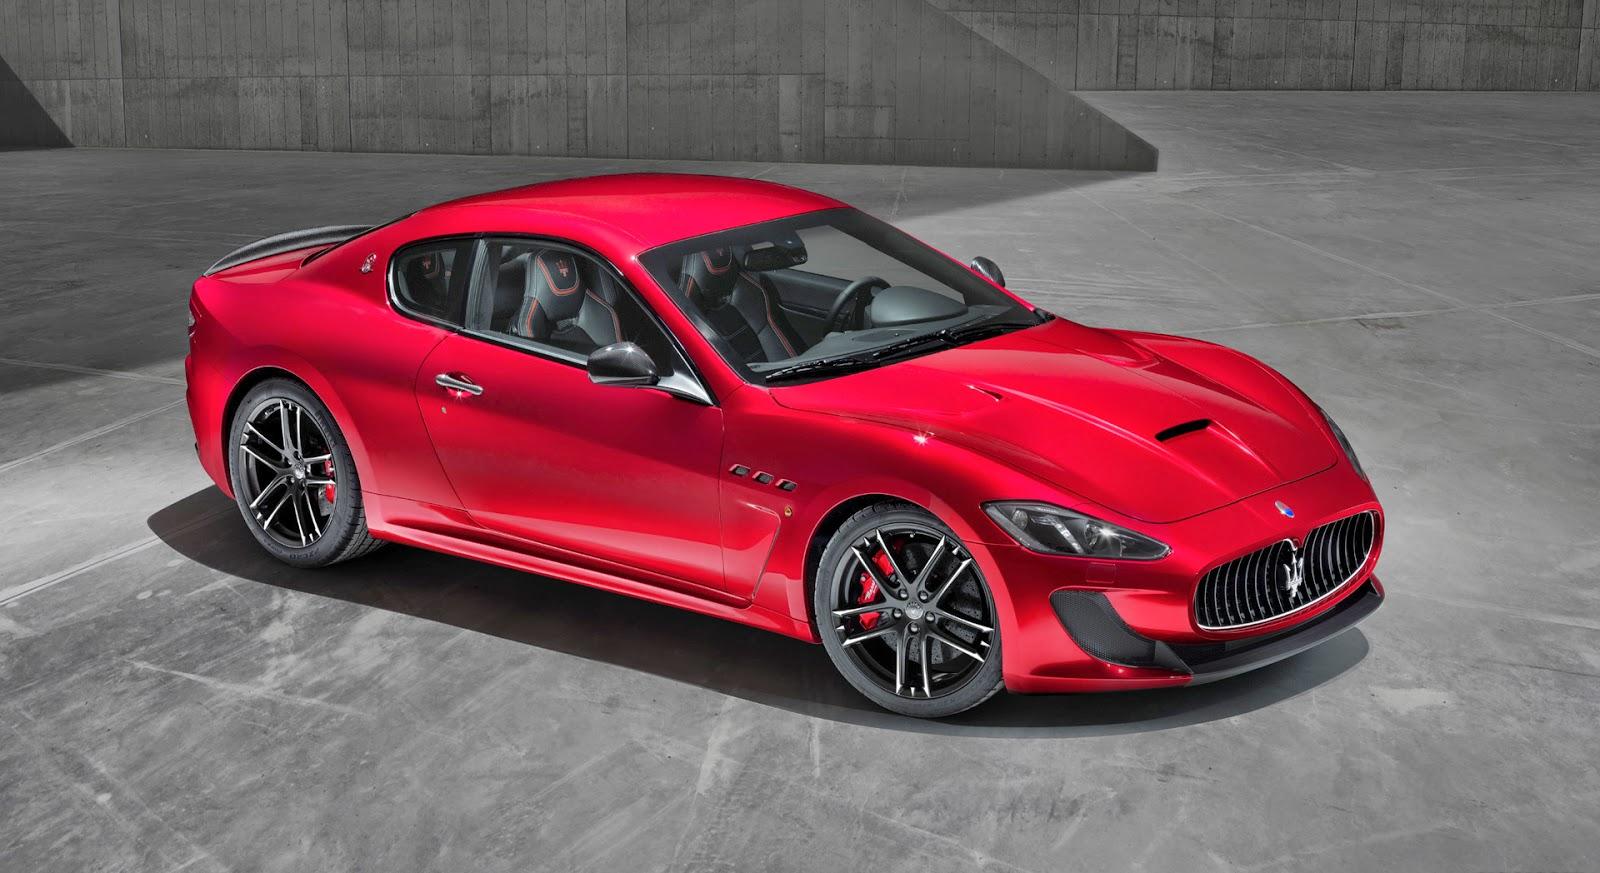 2015 Maserati GranTurismo MC Stradale Centennial - High Wheels